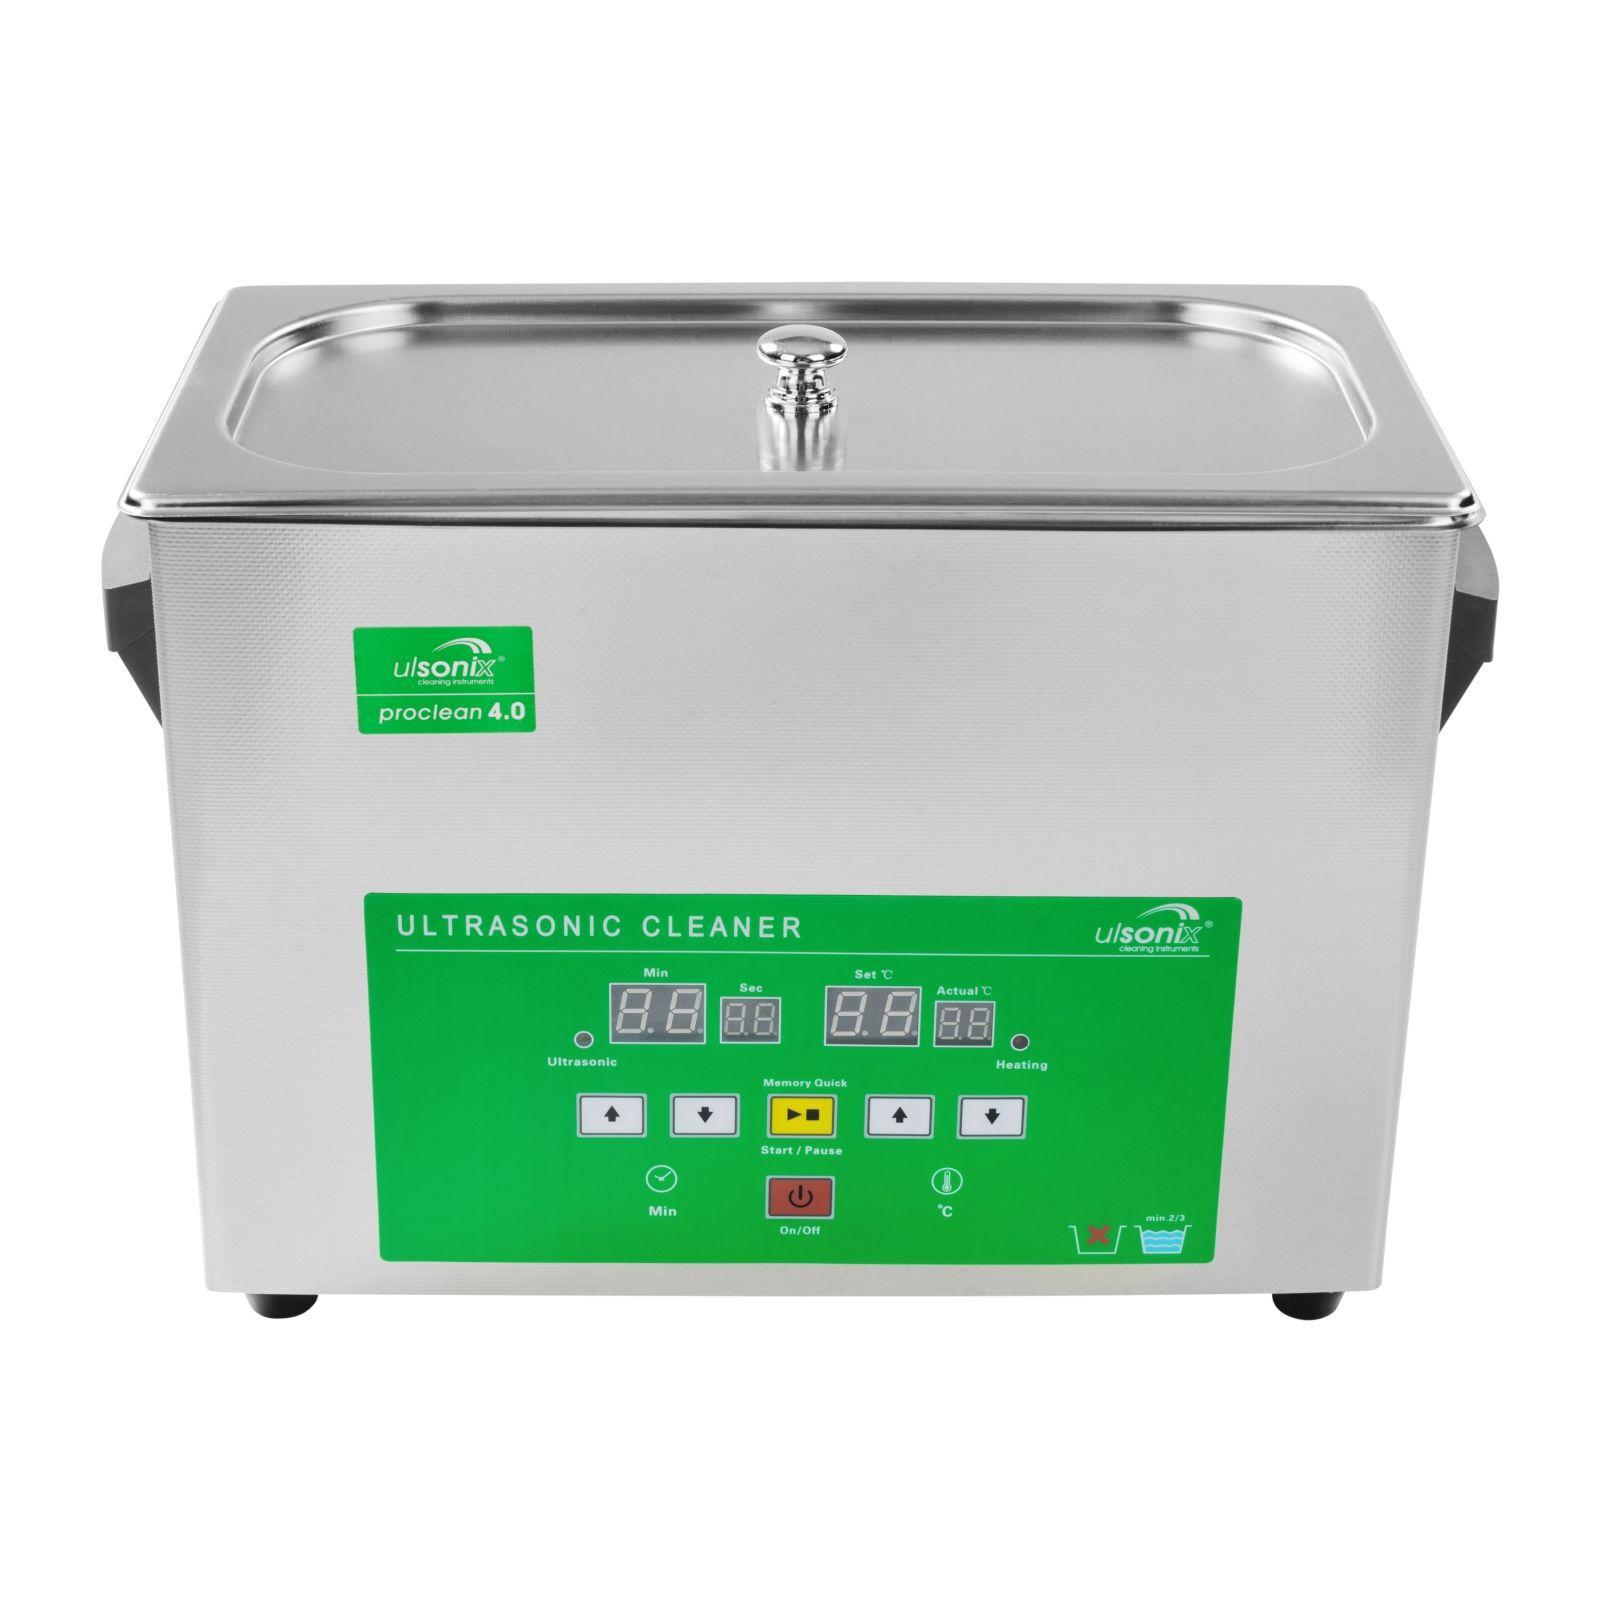 máquina de limpeza ultrassons